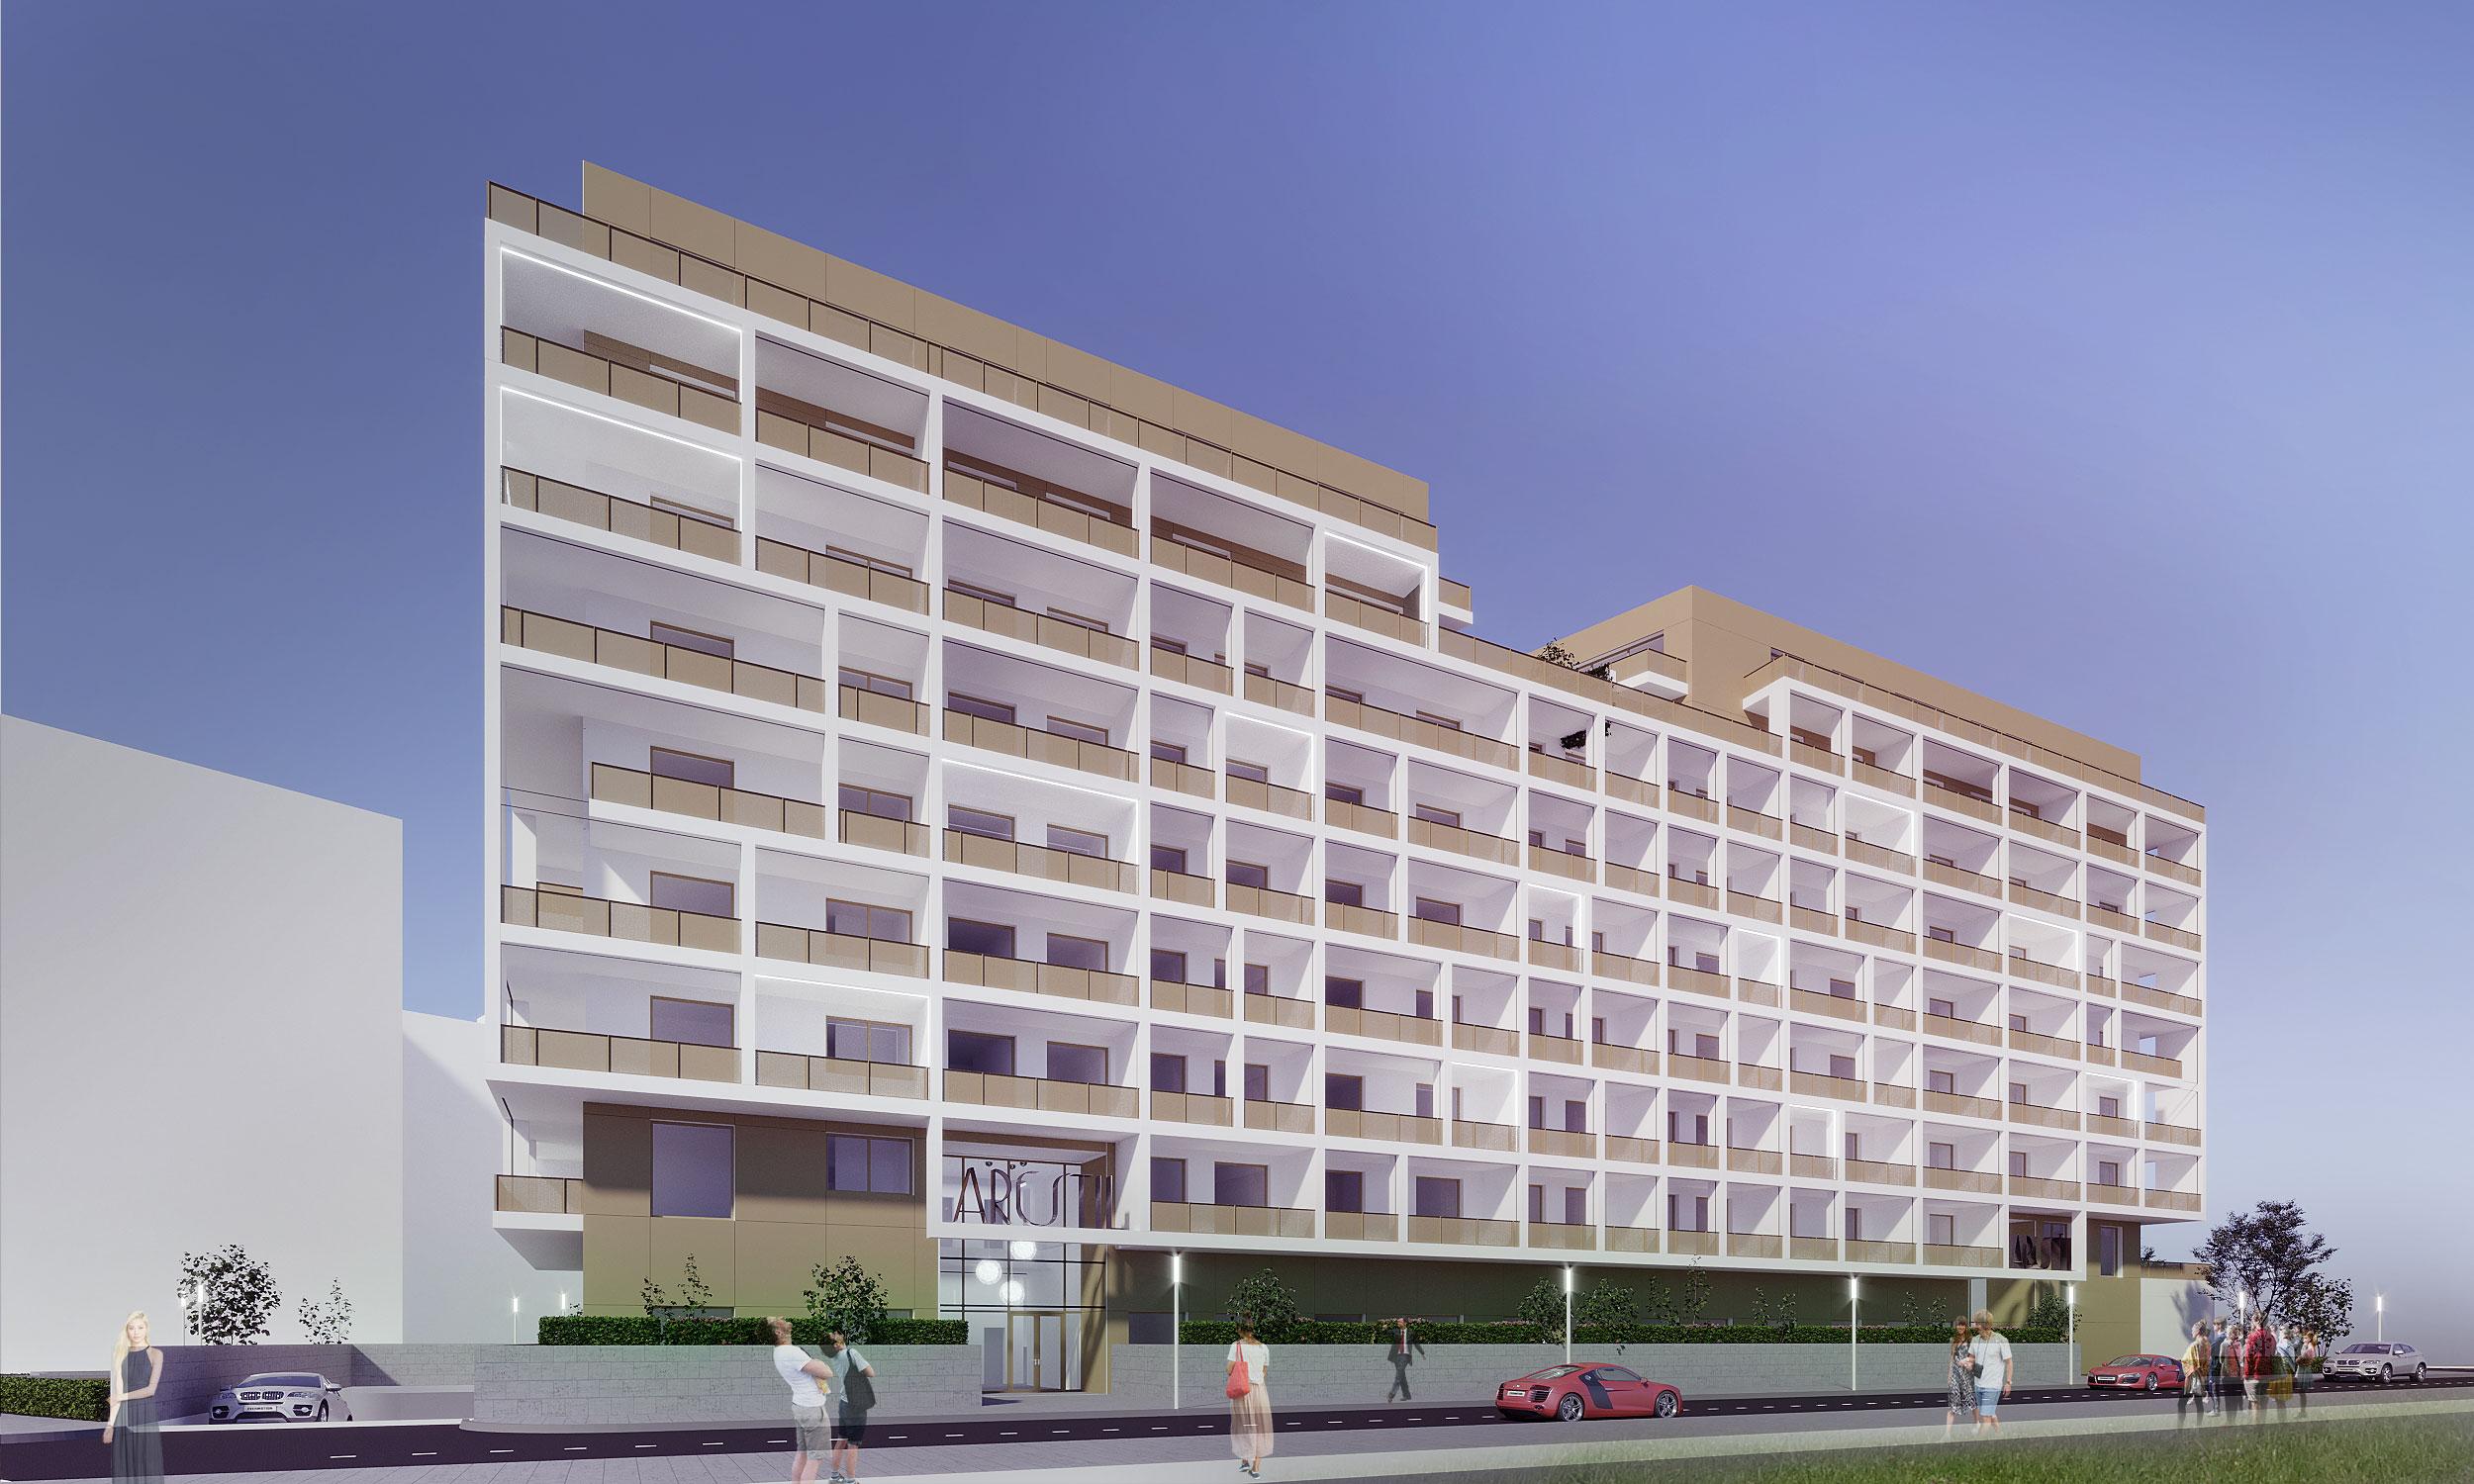 https://nbc-arhitect.ro/wp-content/uploads/2020/10/NBC-Arhitect-_-Glucoza-Residence-_-Bucharest-Romania-_-exterior-view_2-1.jpg